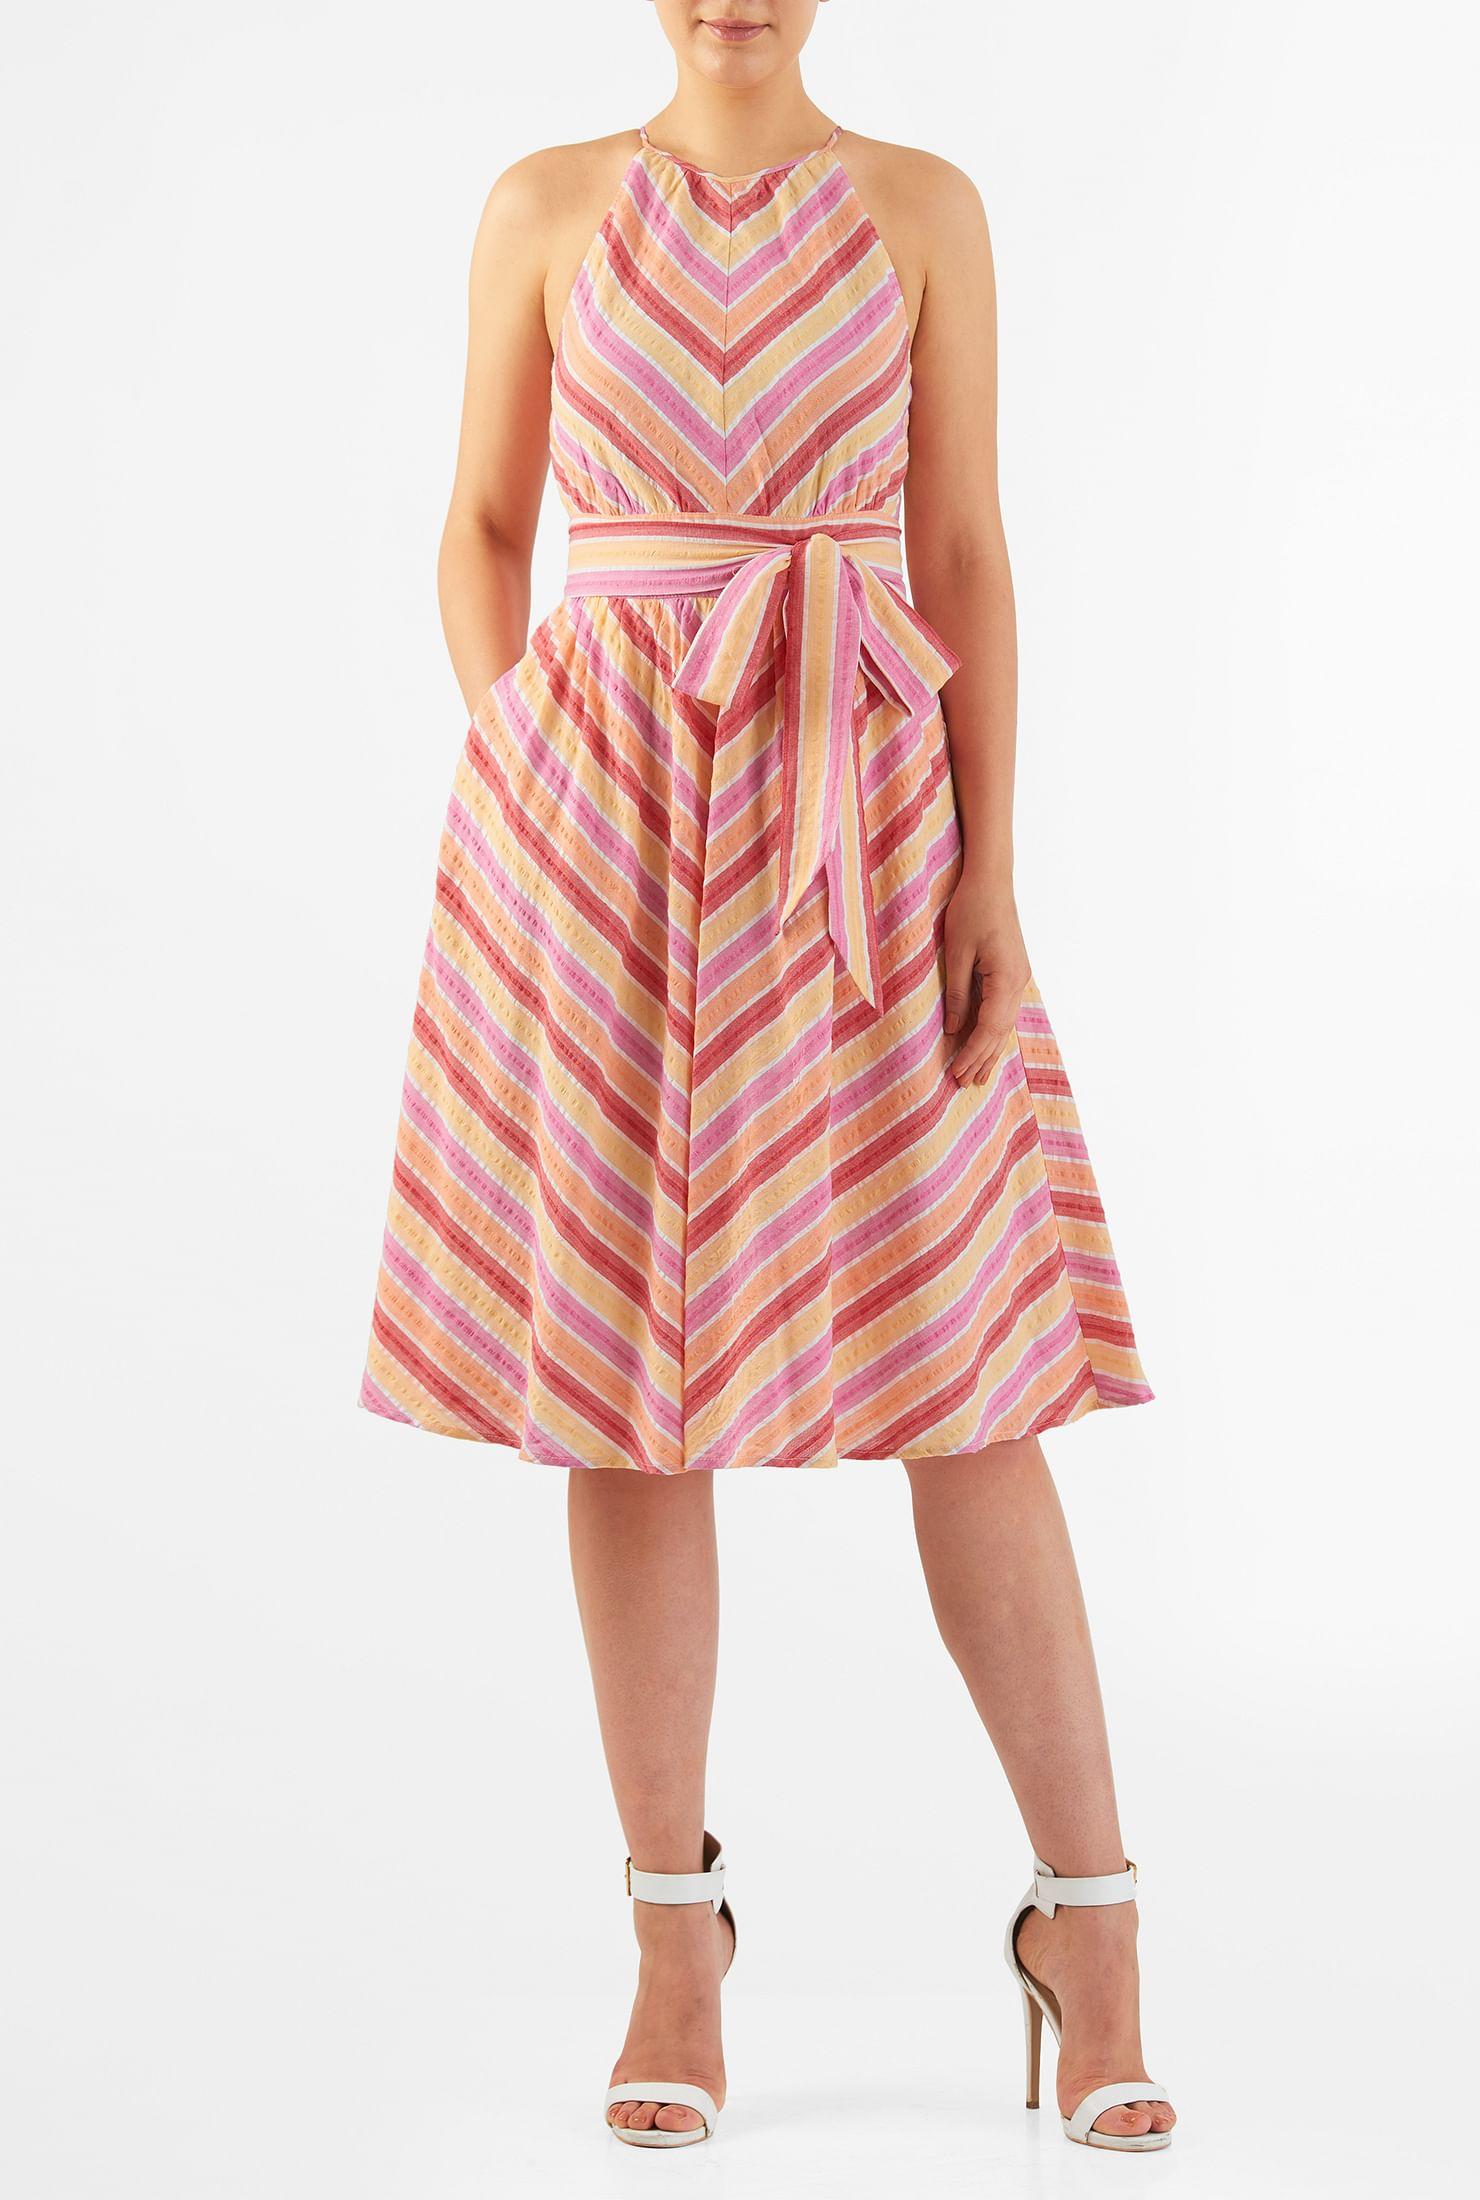 Women S Fashion Clothing Sizes 0 36w Custom Dresses Women S